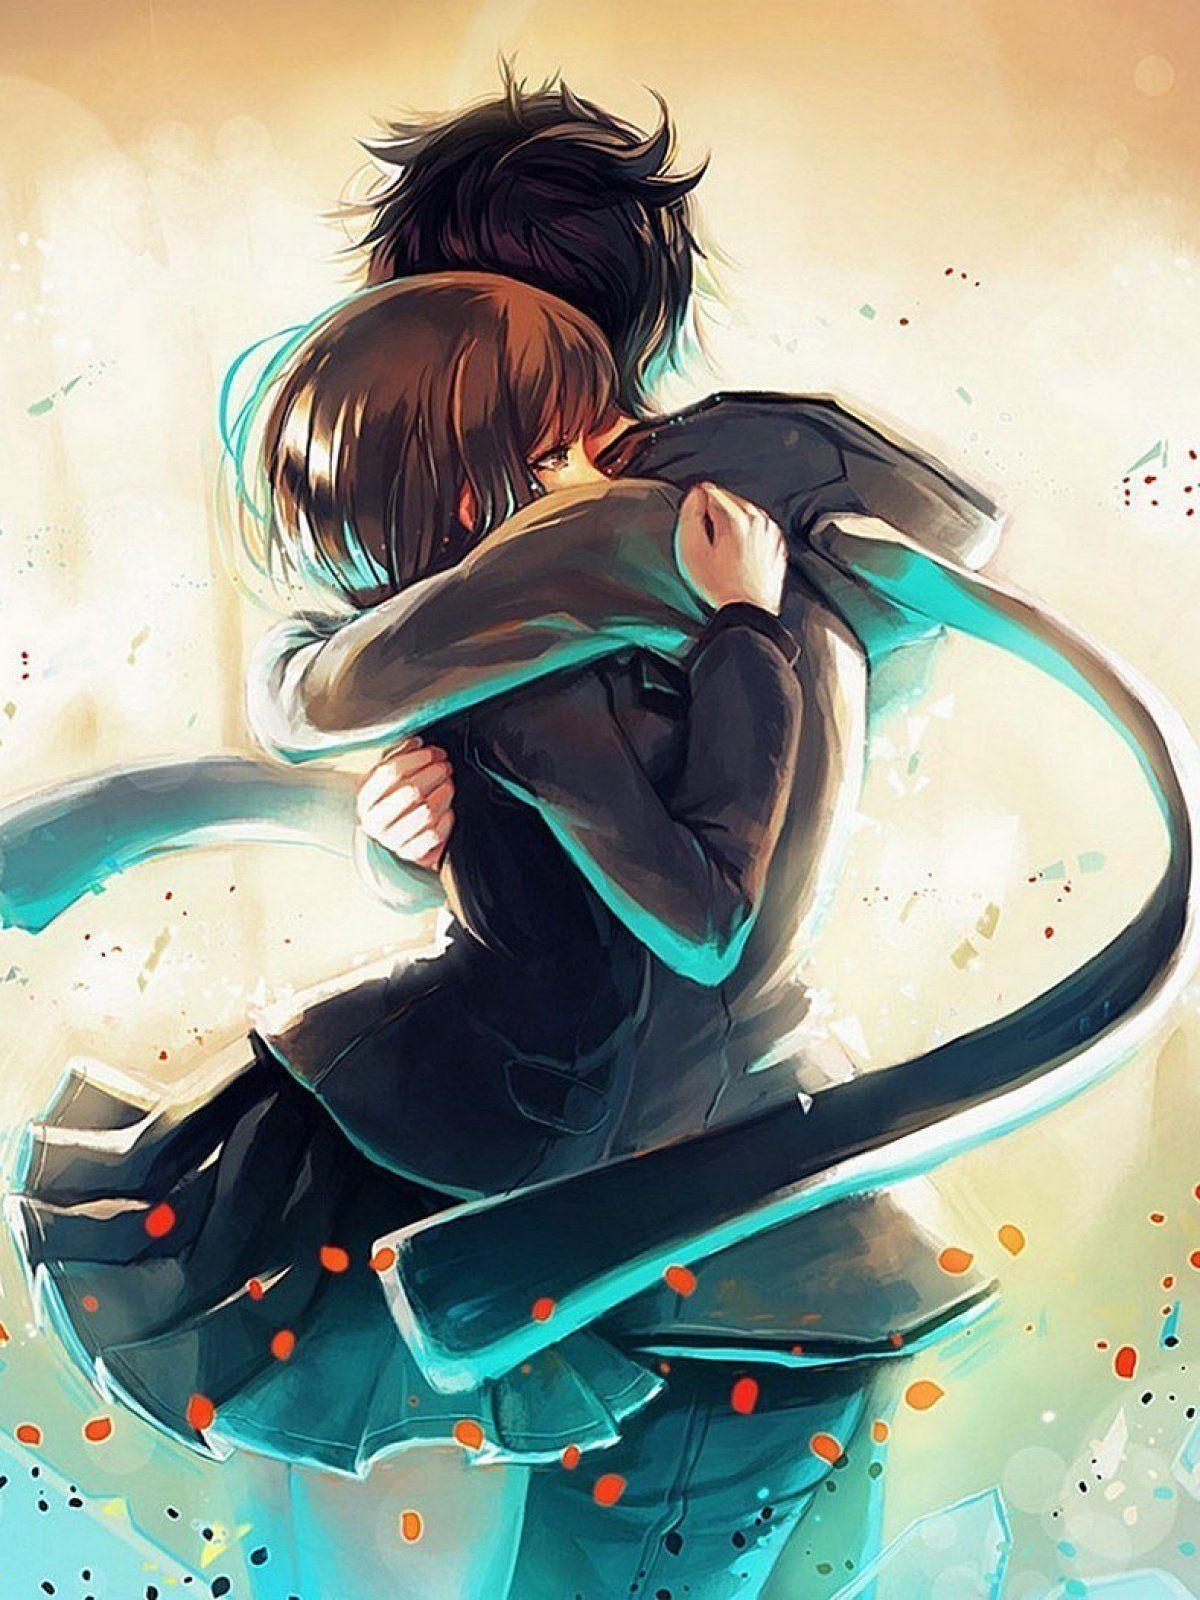 Anime Girl Hugging Boy : anime, hugging, Anime, Huging, Wallpapers, Wallpaper